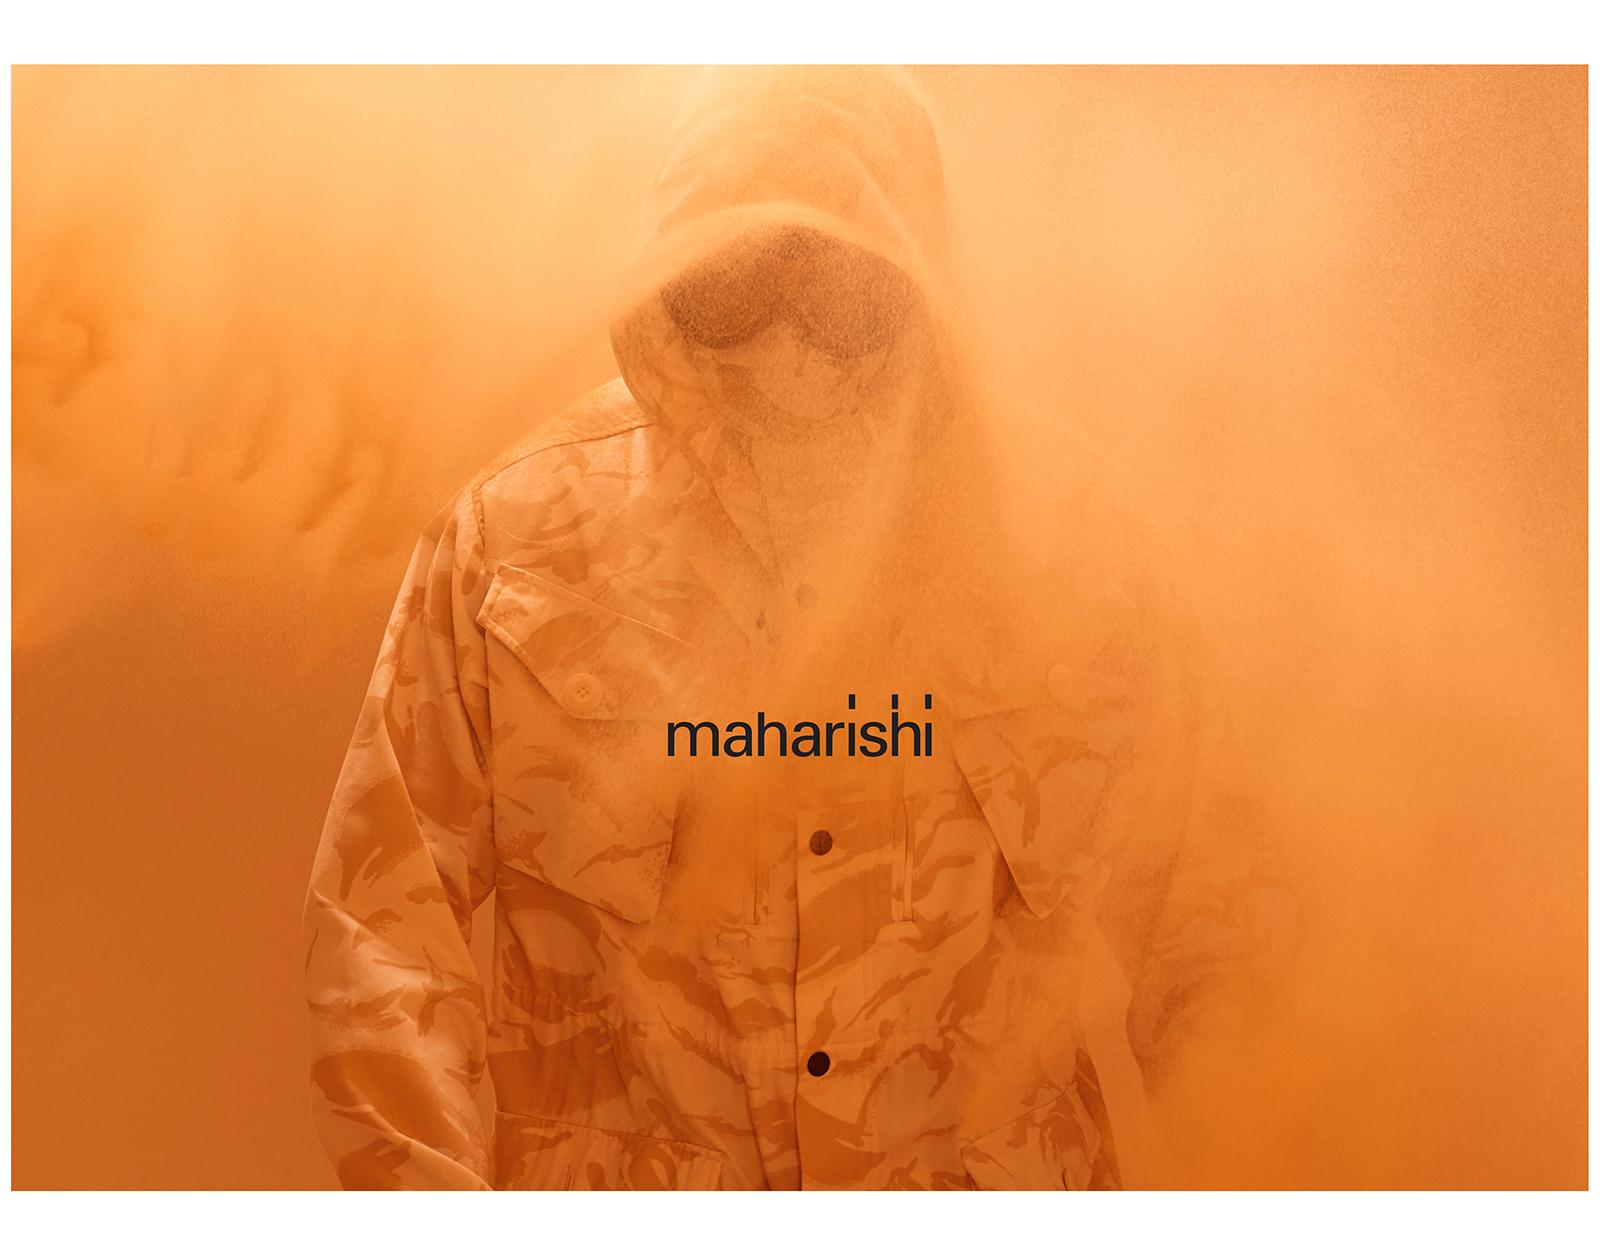 ASS_Maharishi_004.jpg